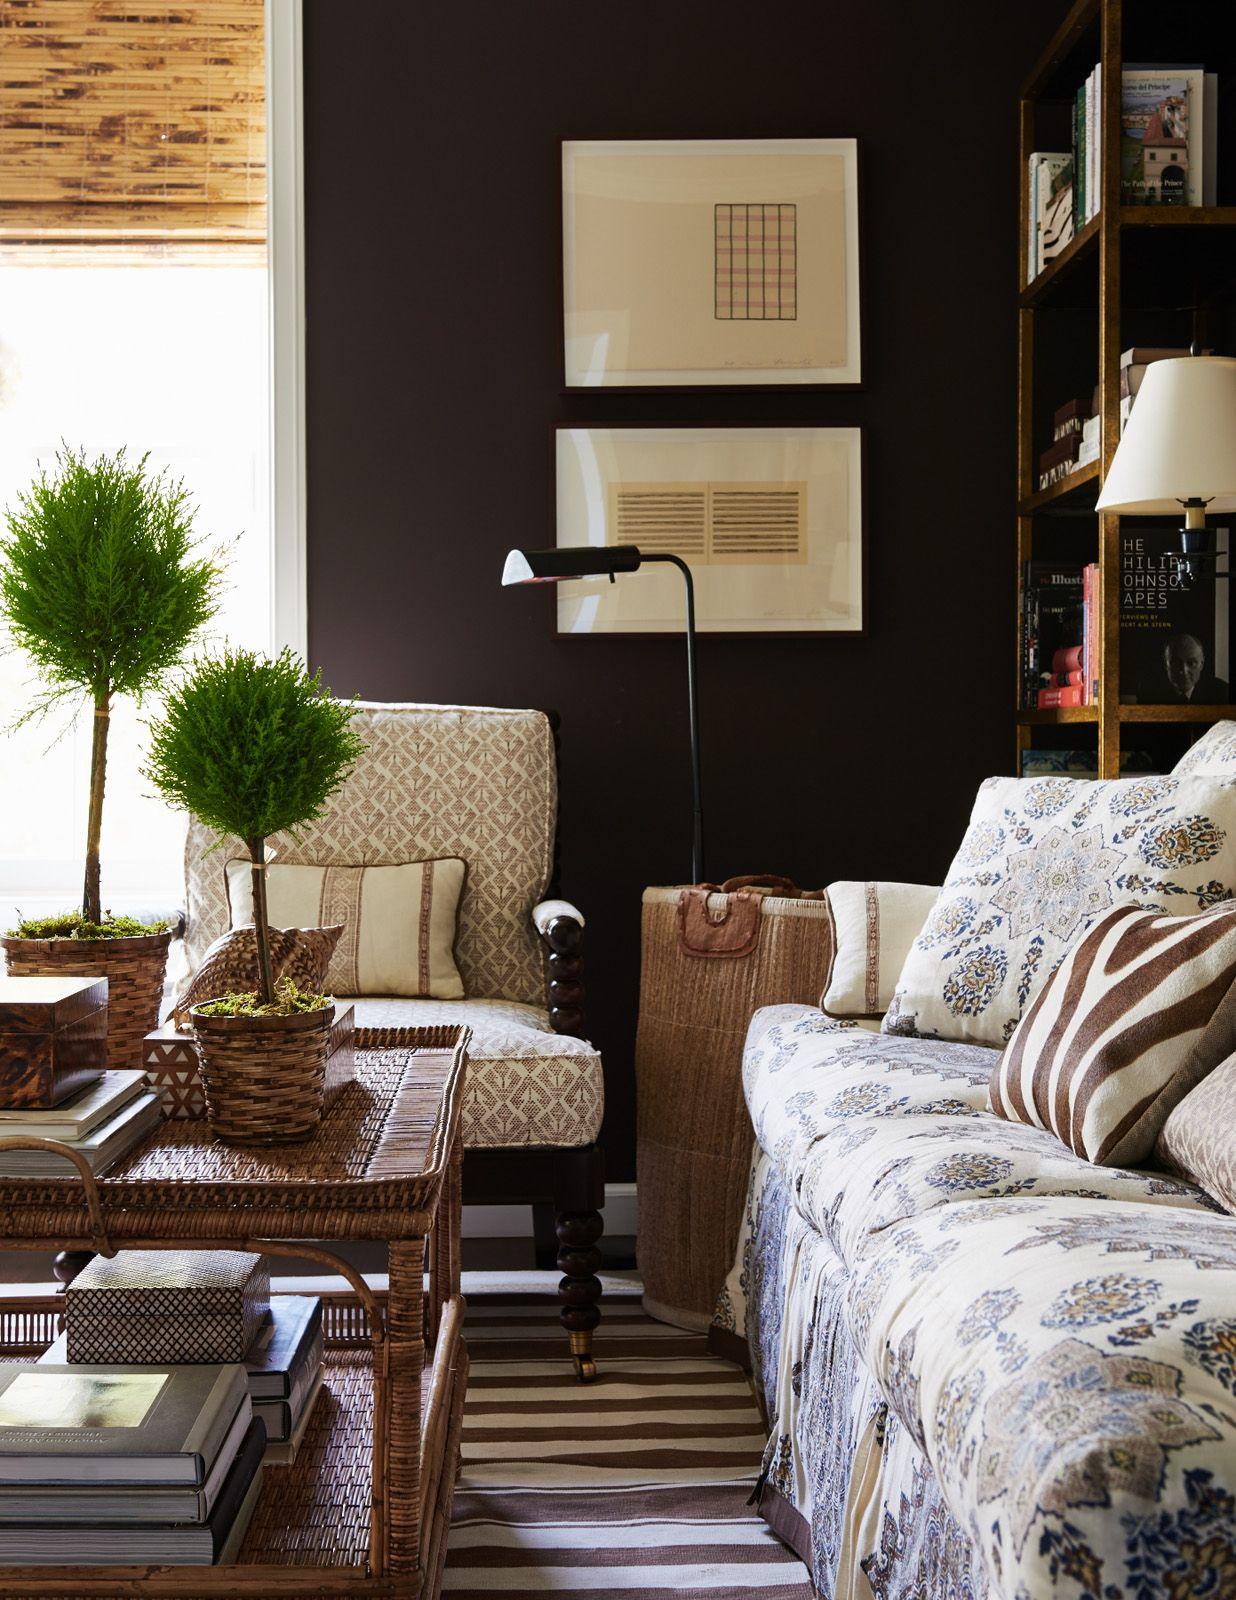 Design Crush Mark D Sikes Katie Considers Brown Walls Living Room Dark Brown Walls Brown Rooms